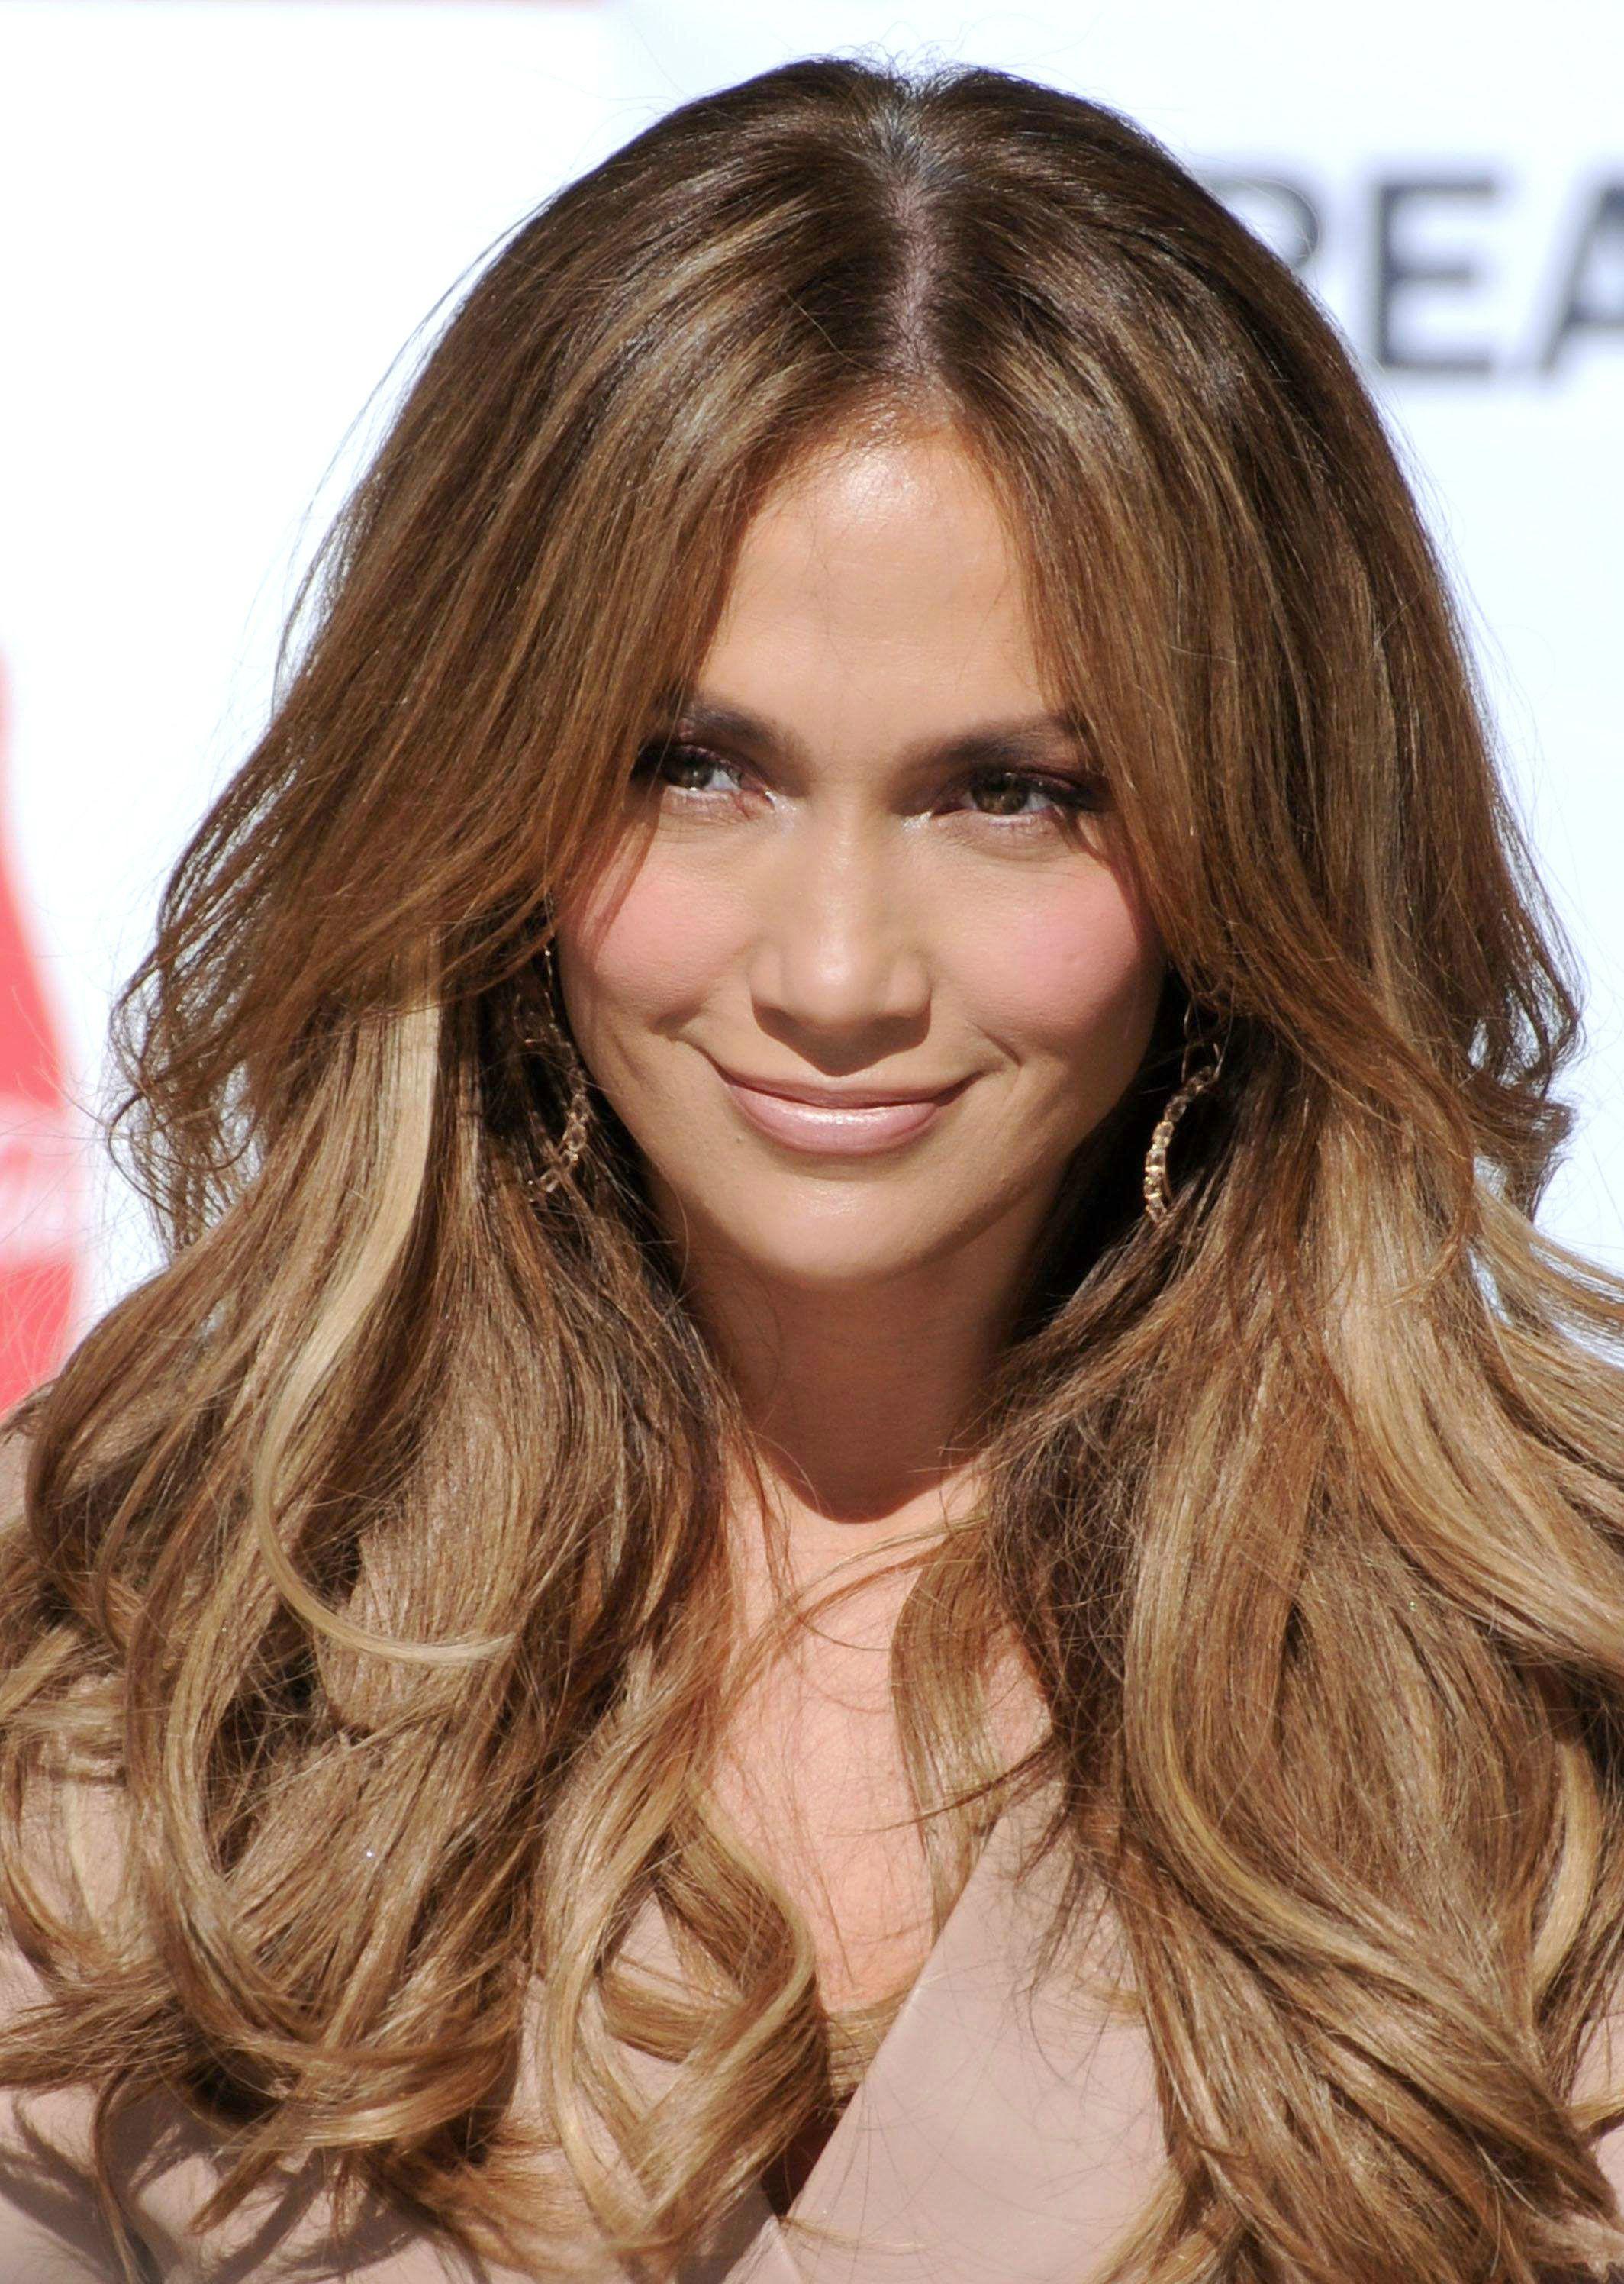 Image C/O Rex. Jennifer Lopez on 30th November 2010.